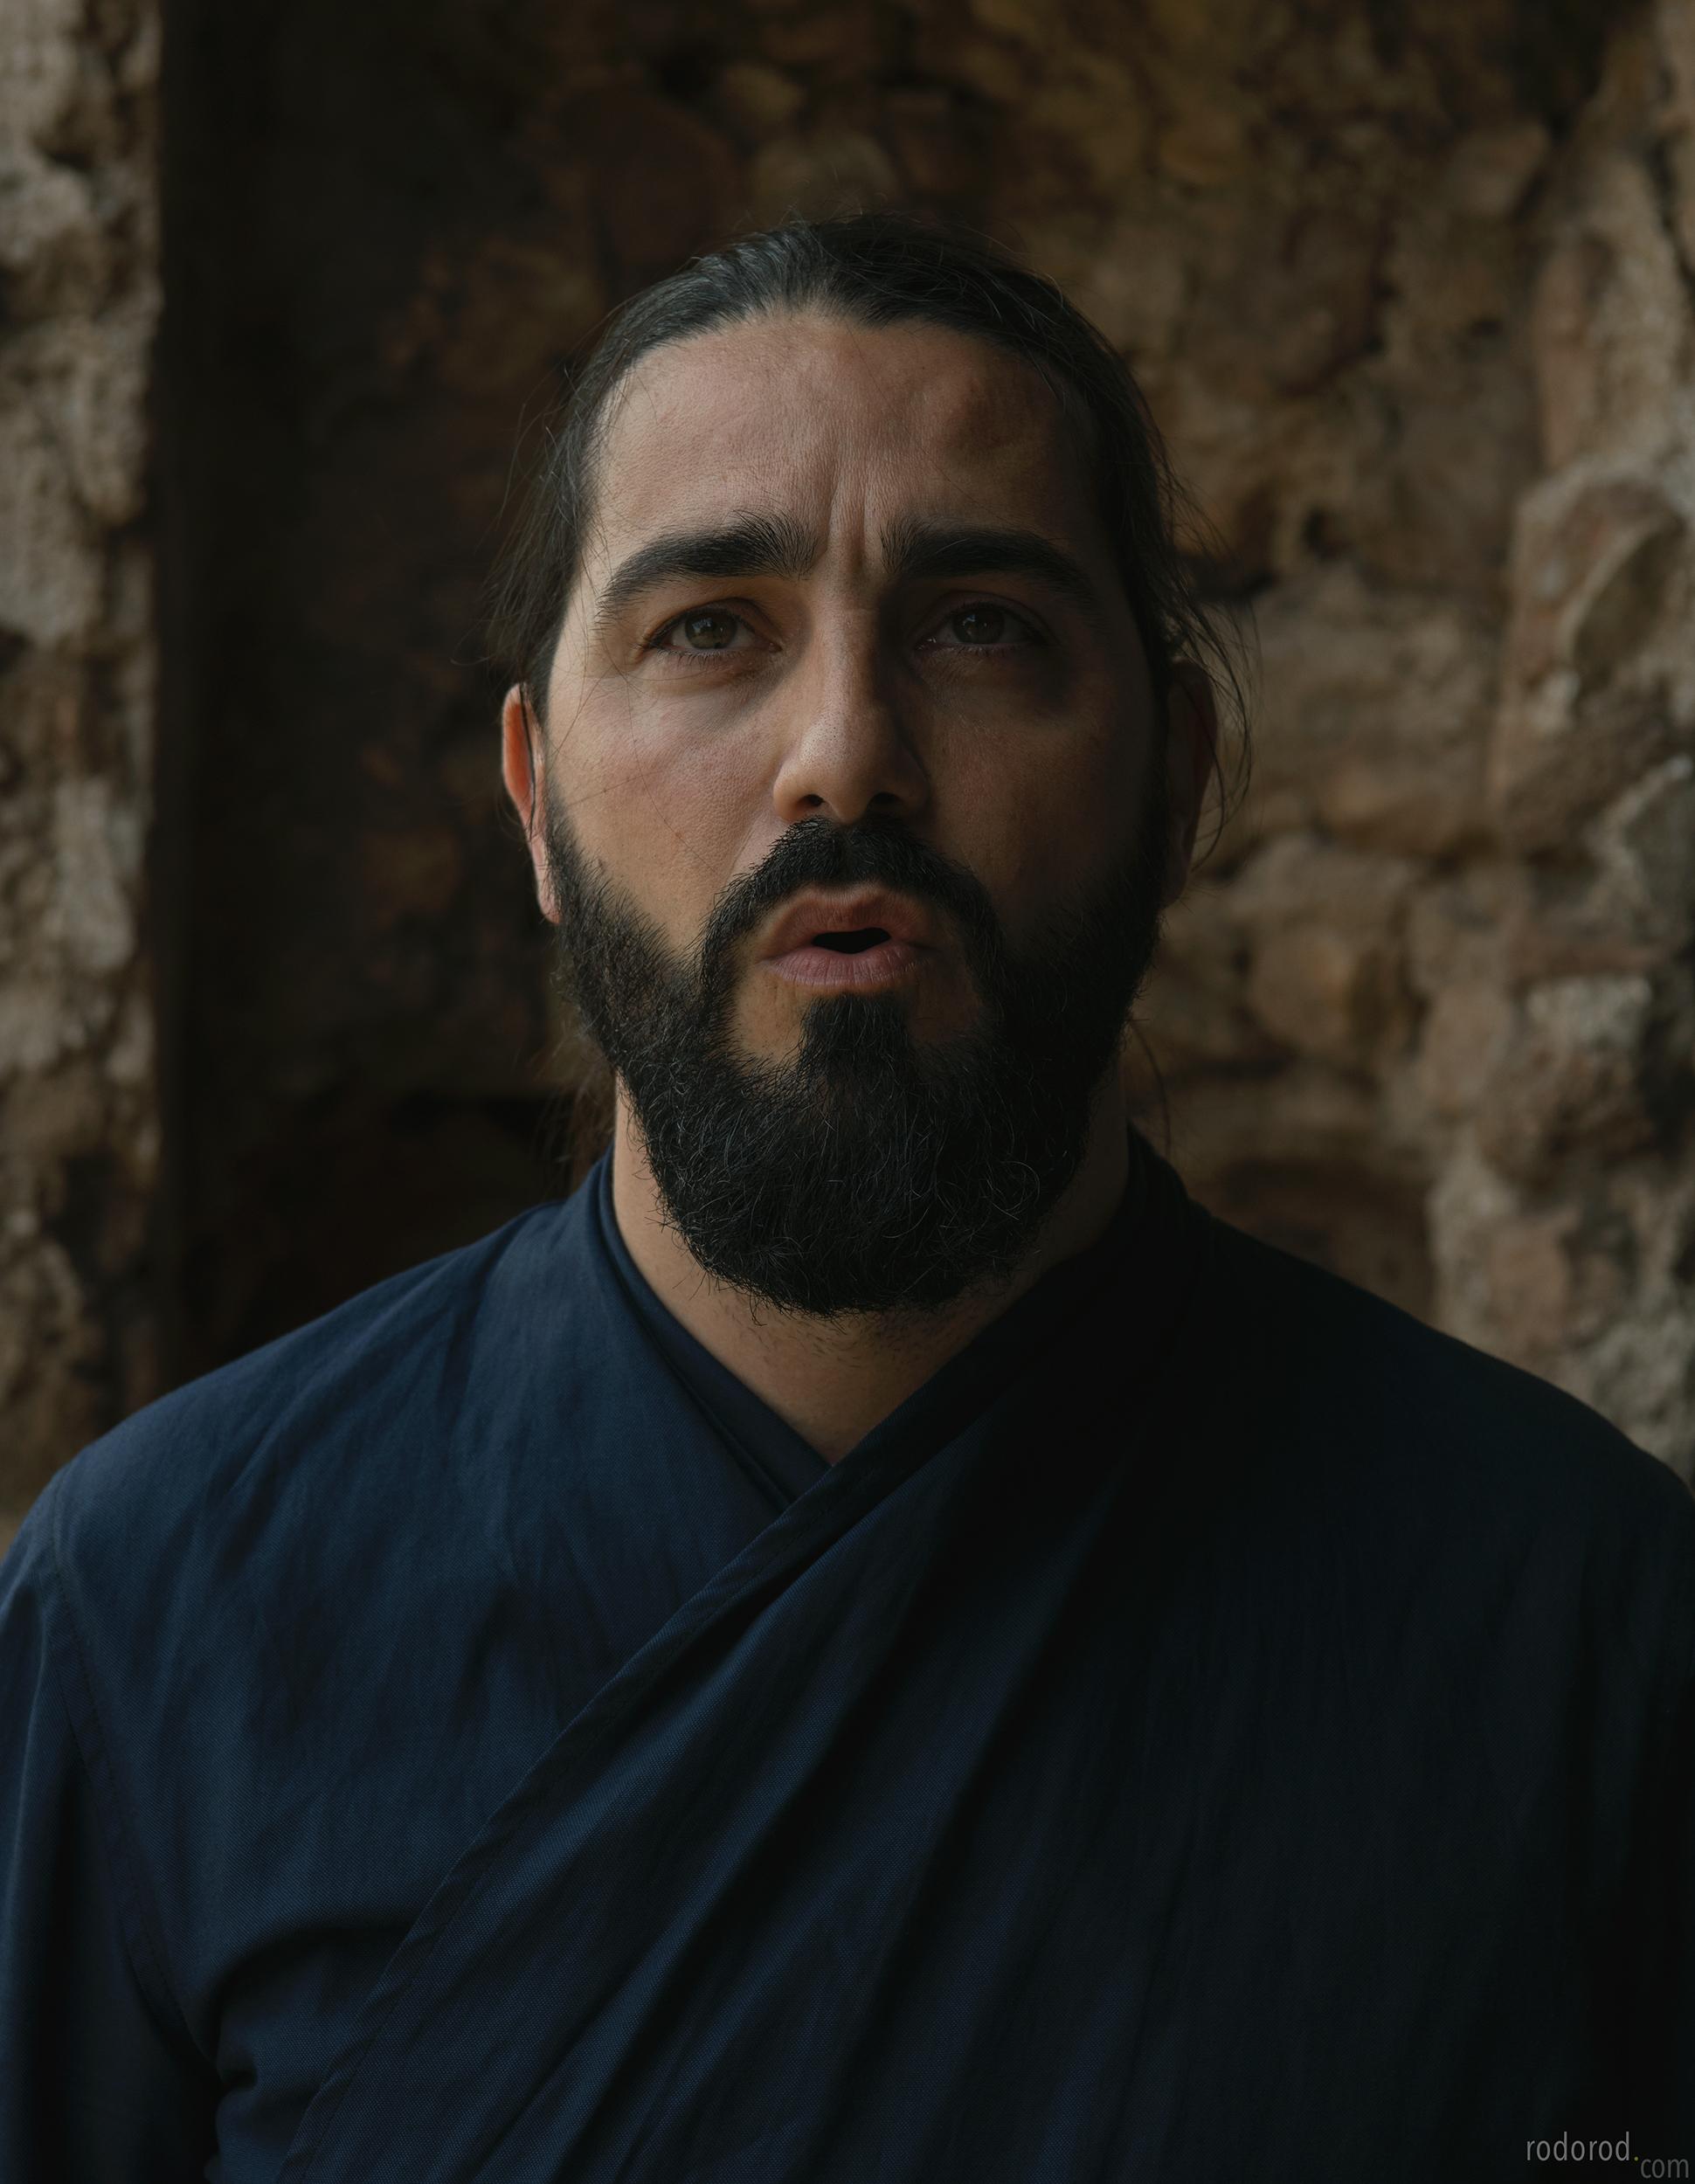 Germán de la Riva